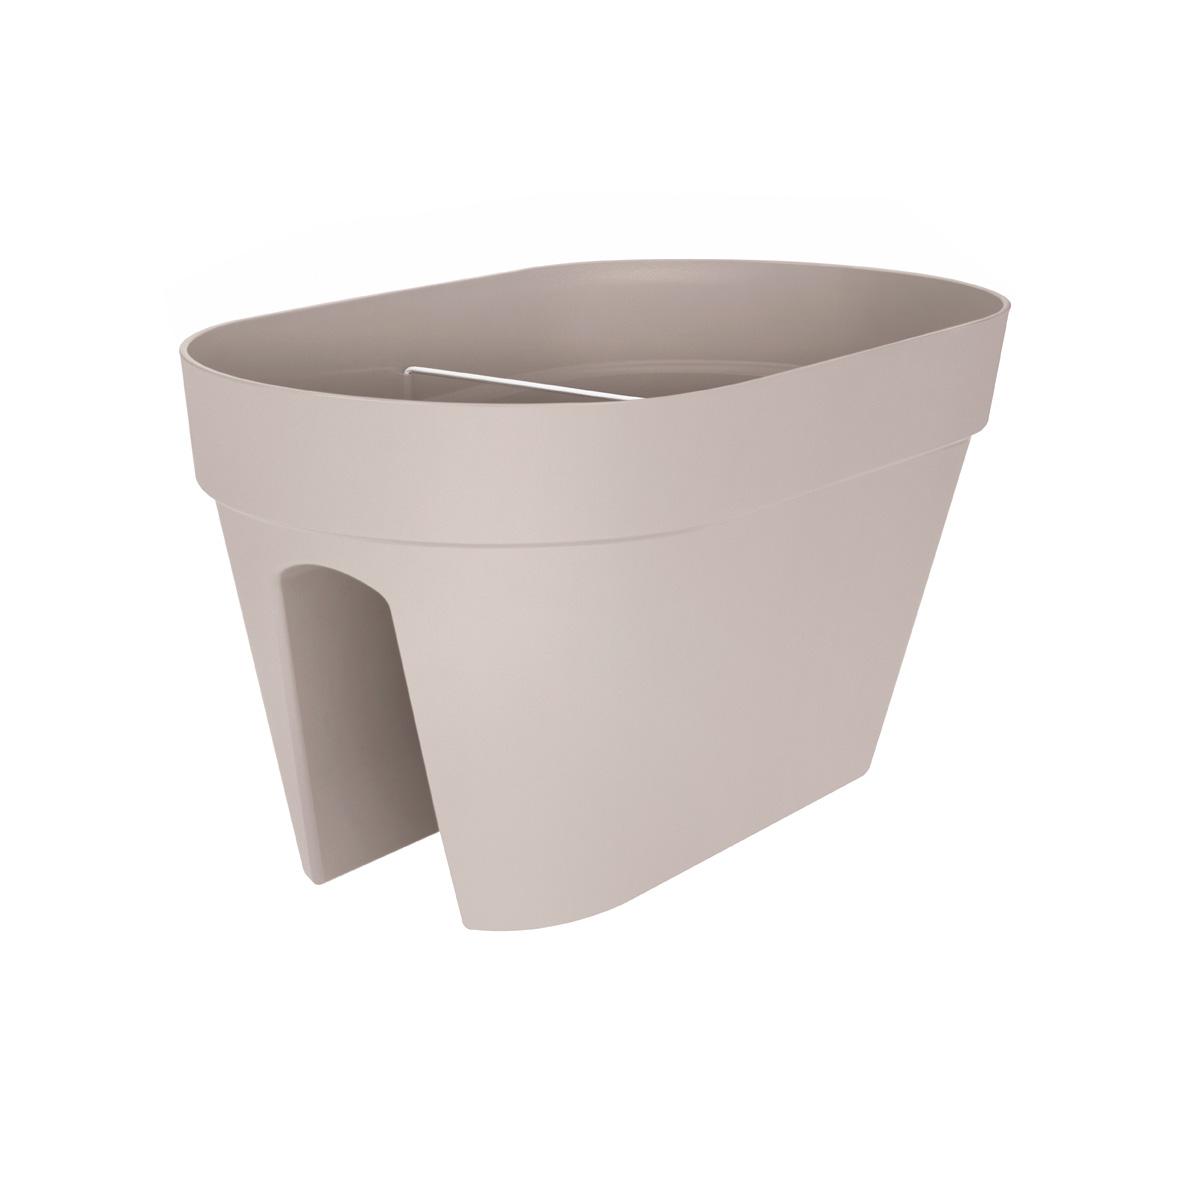 elho loft urban flowerbridge 50x29x26 cm warmes grau d s. Black Bedroom Furniture Sets. Home Design Ideas